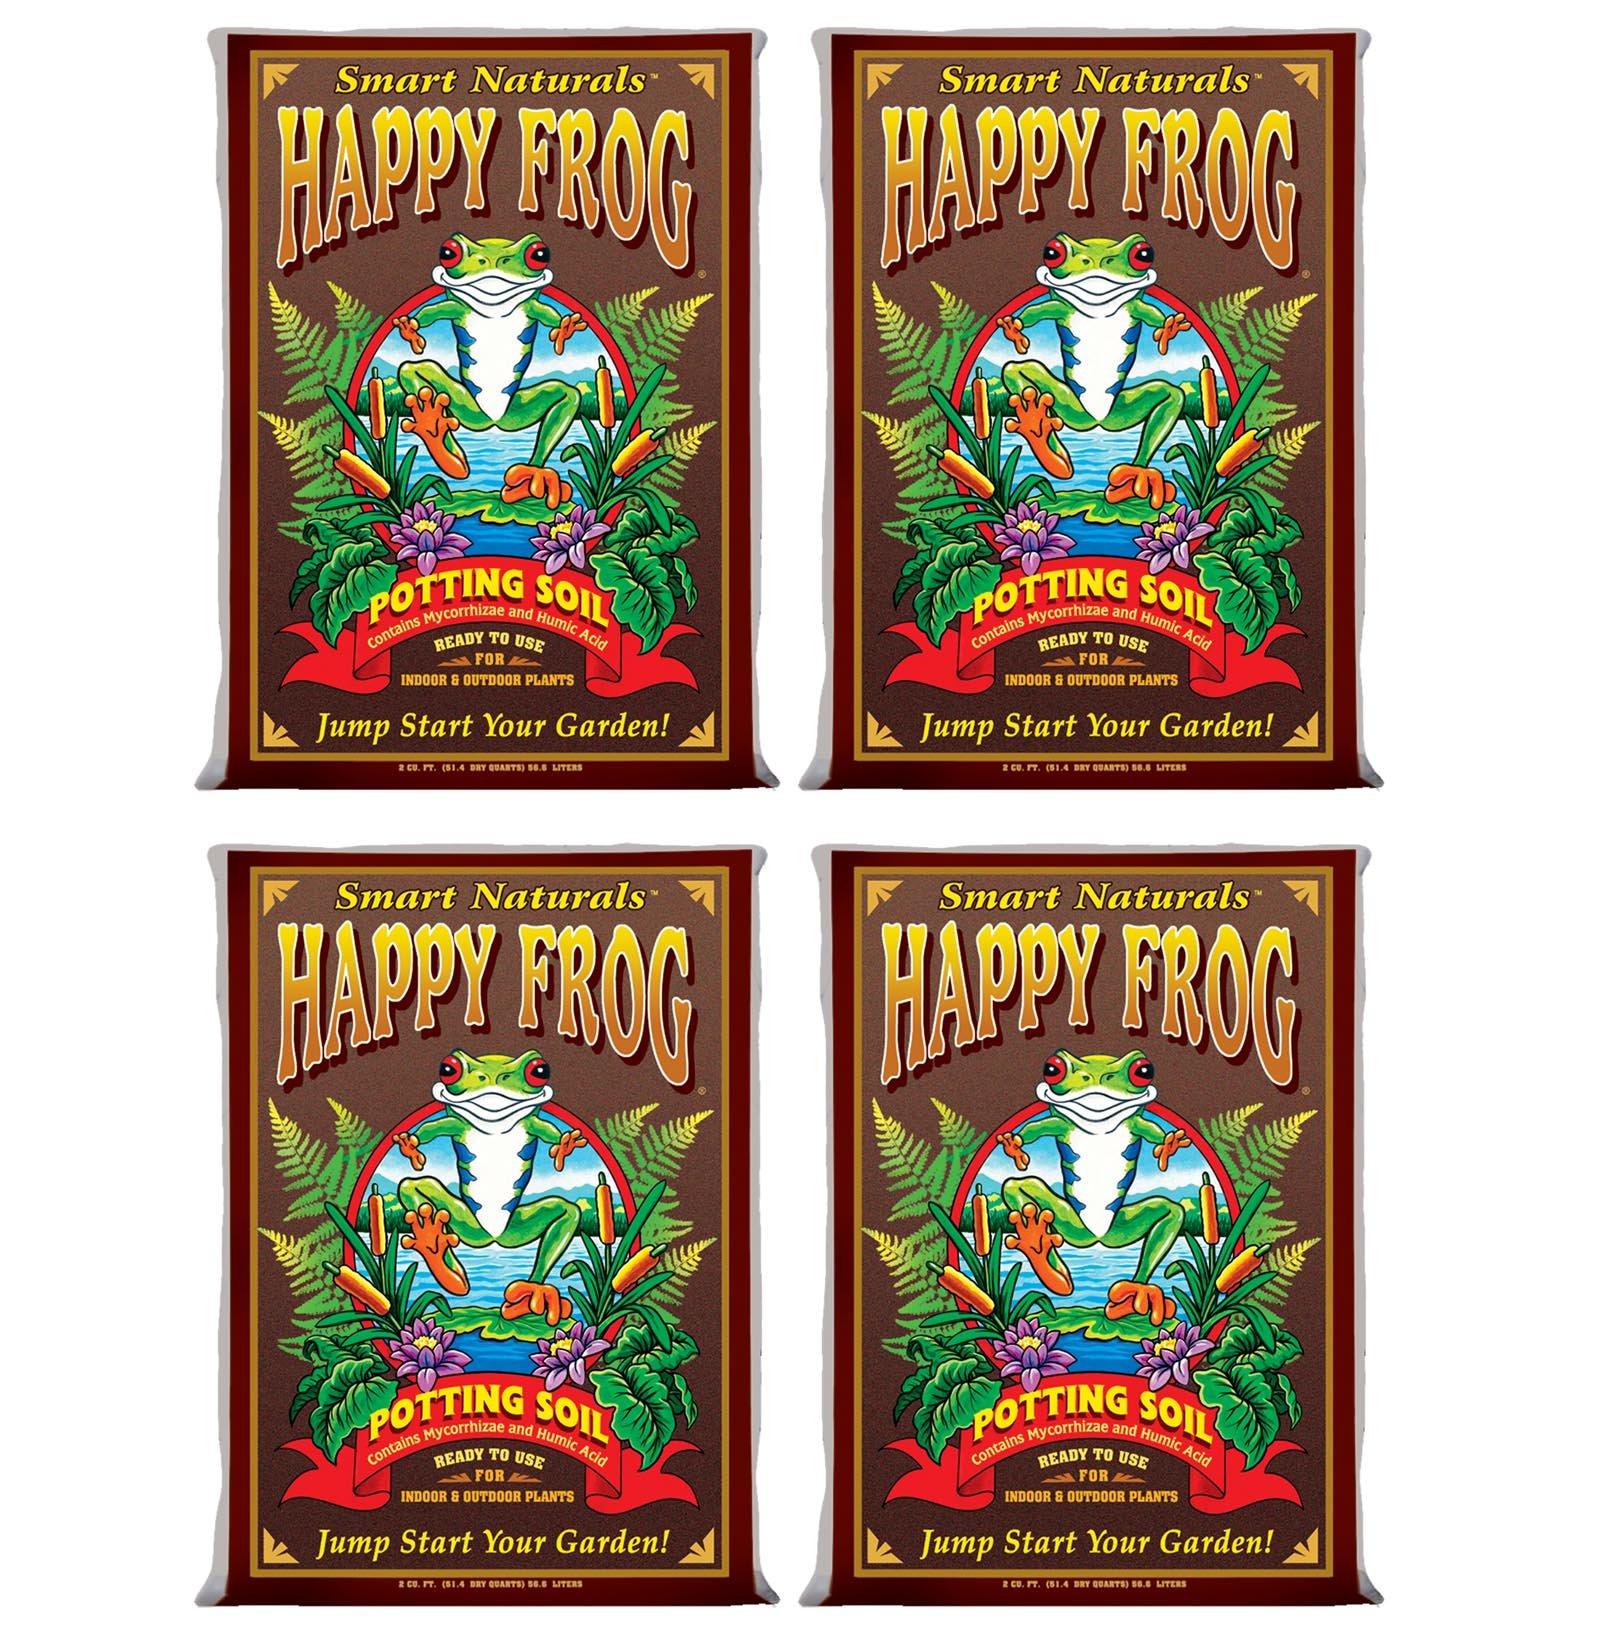 (4) FOXFARM FX14047 pH Adjusted Happy Frog Organic Potting Soil Bags | 8 Cu Ft